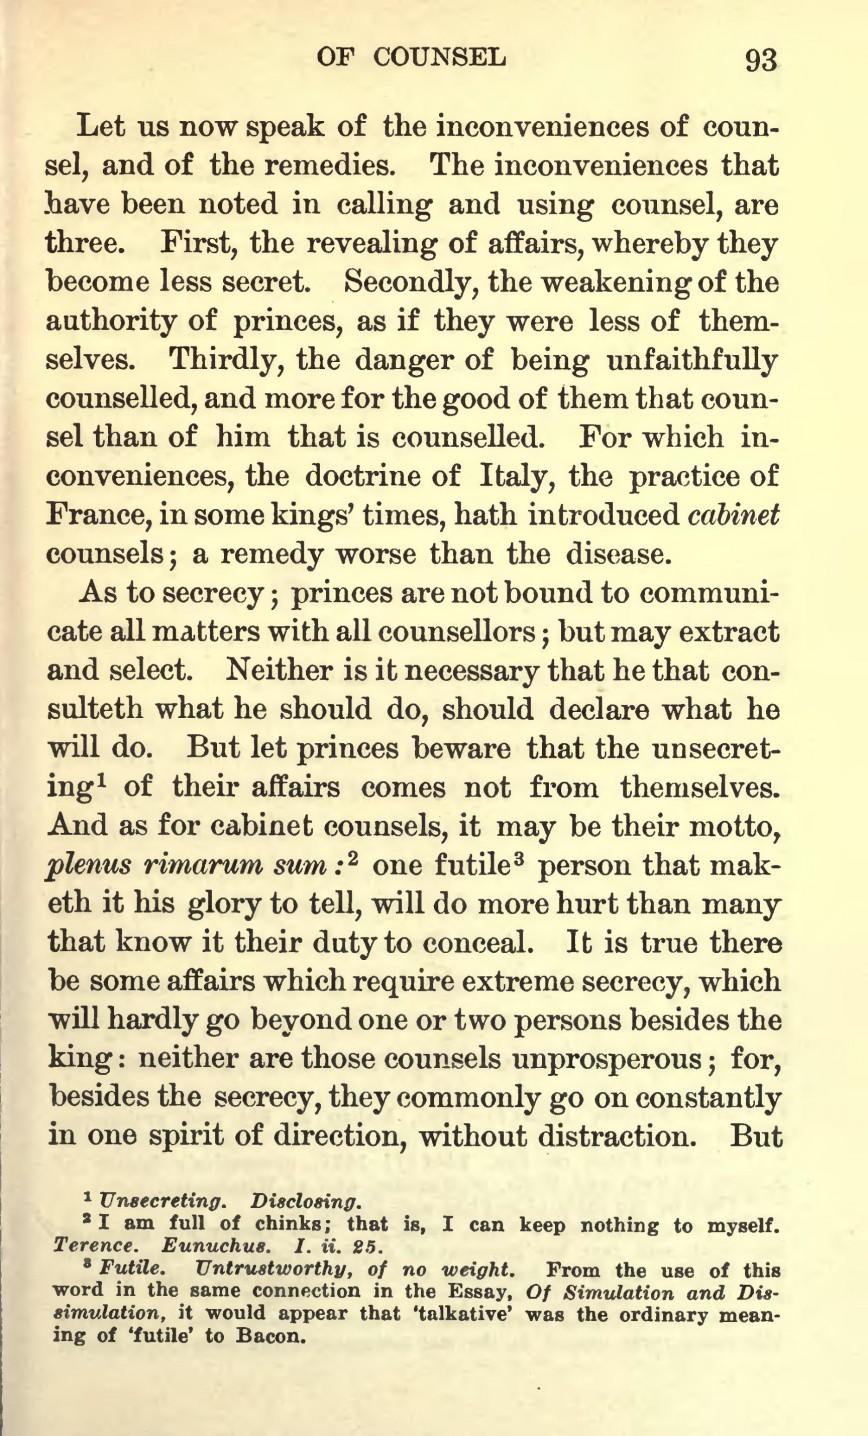 007 Page203 1728px Essays Of Francis Bacon 1908 Scott Djvu Bacons Essay Amazing Studies Text Truth Summary In Urdu Explanation